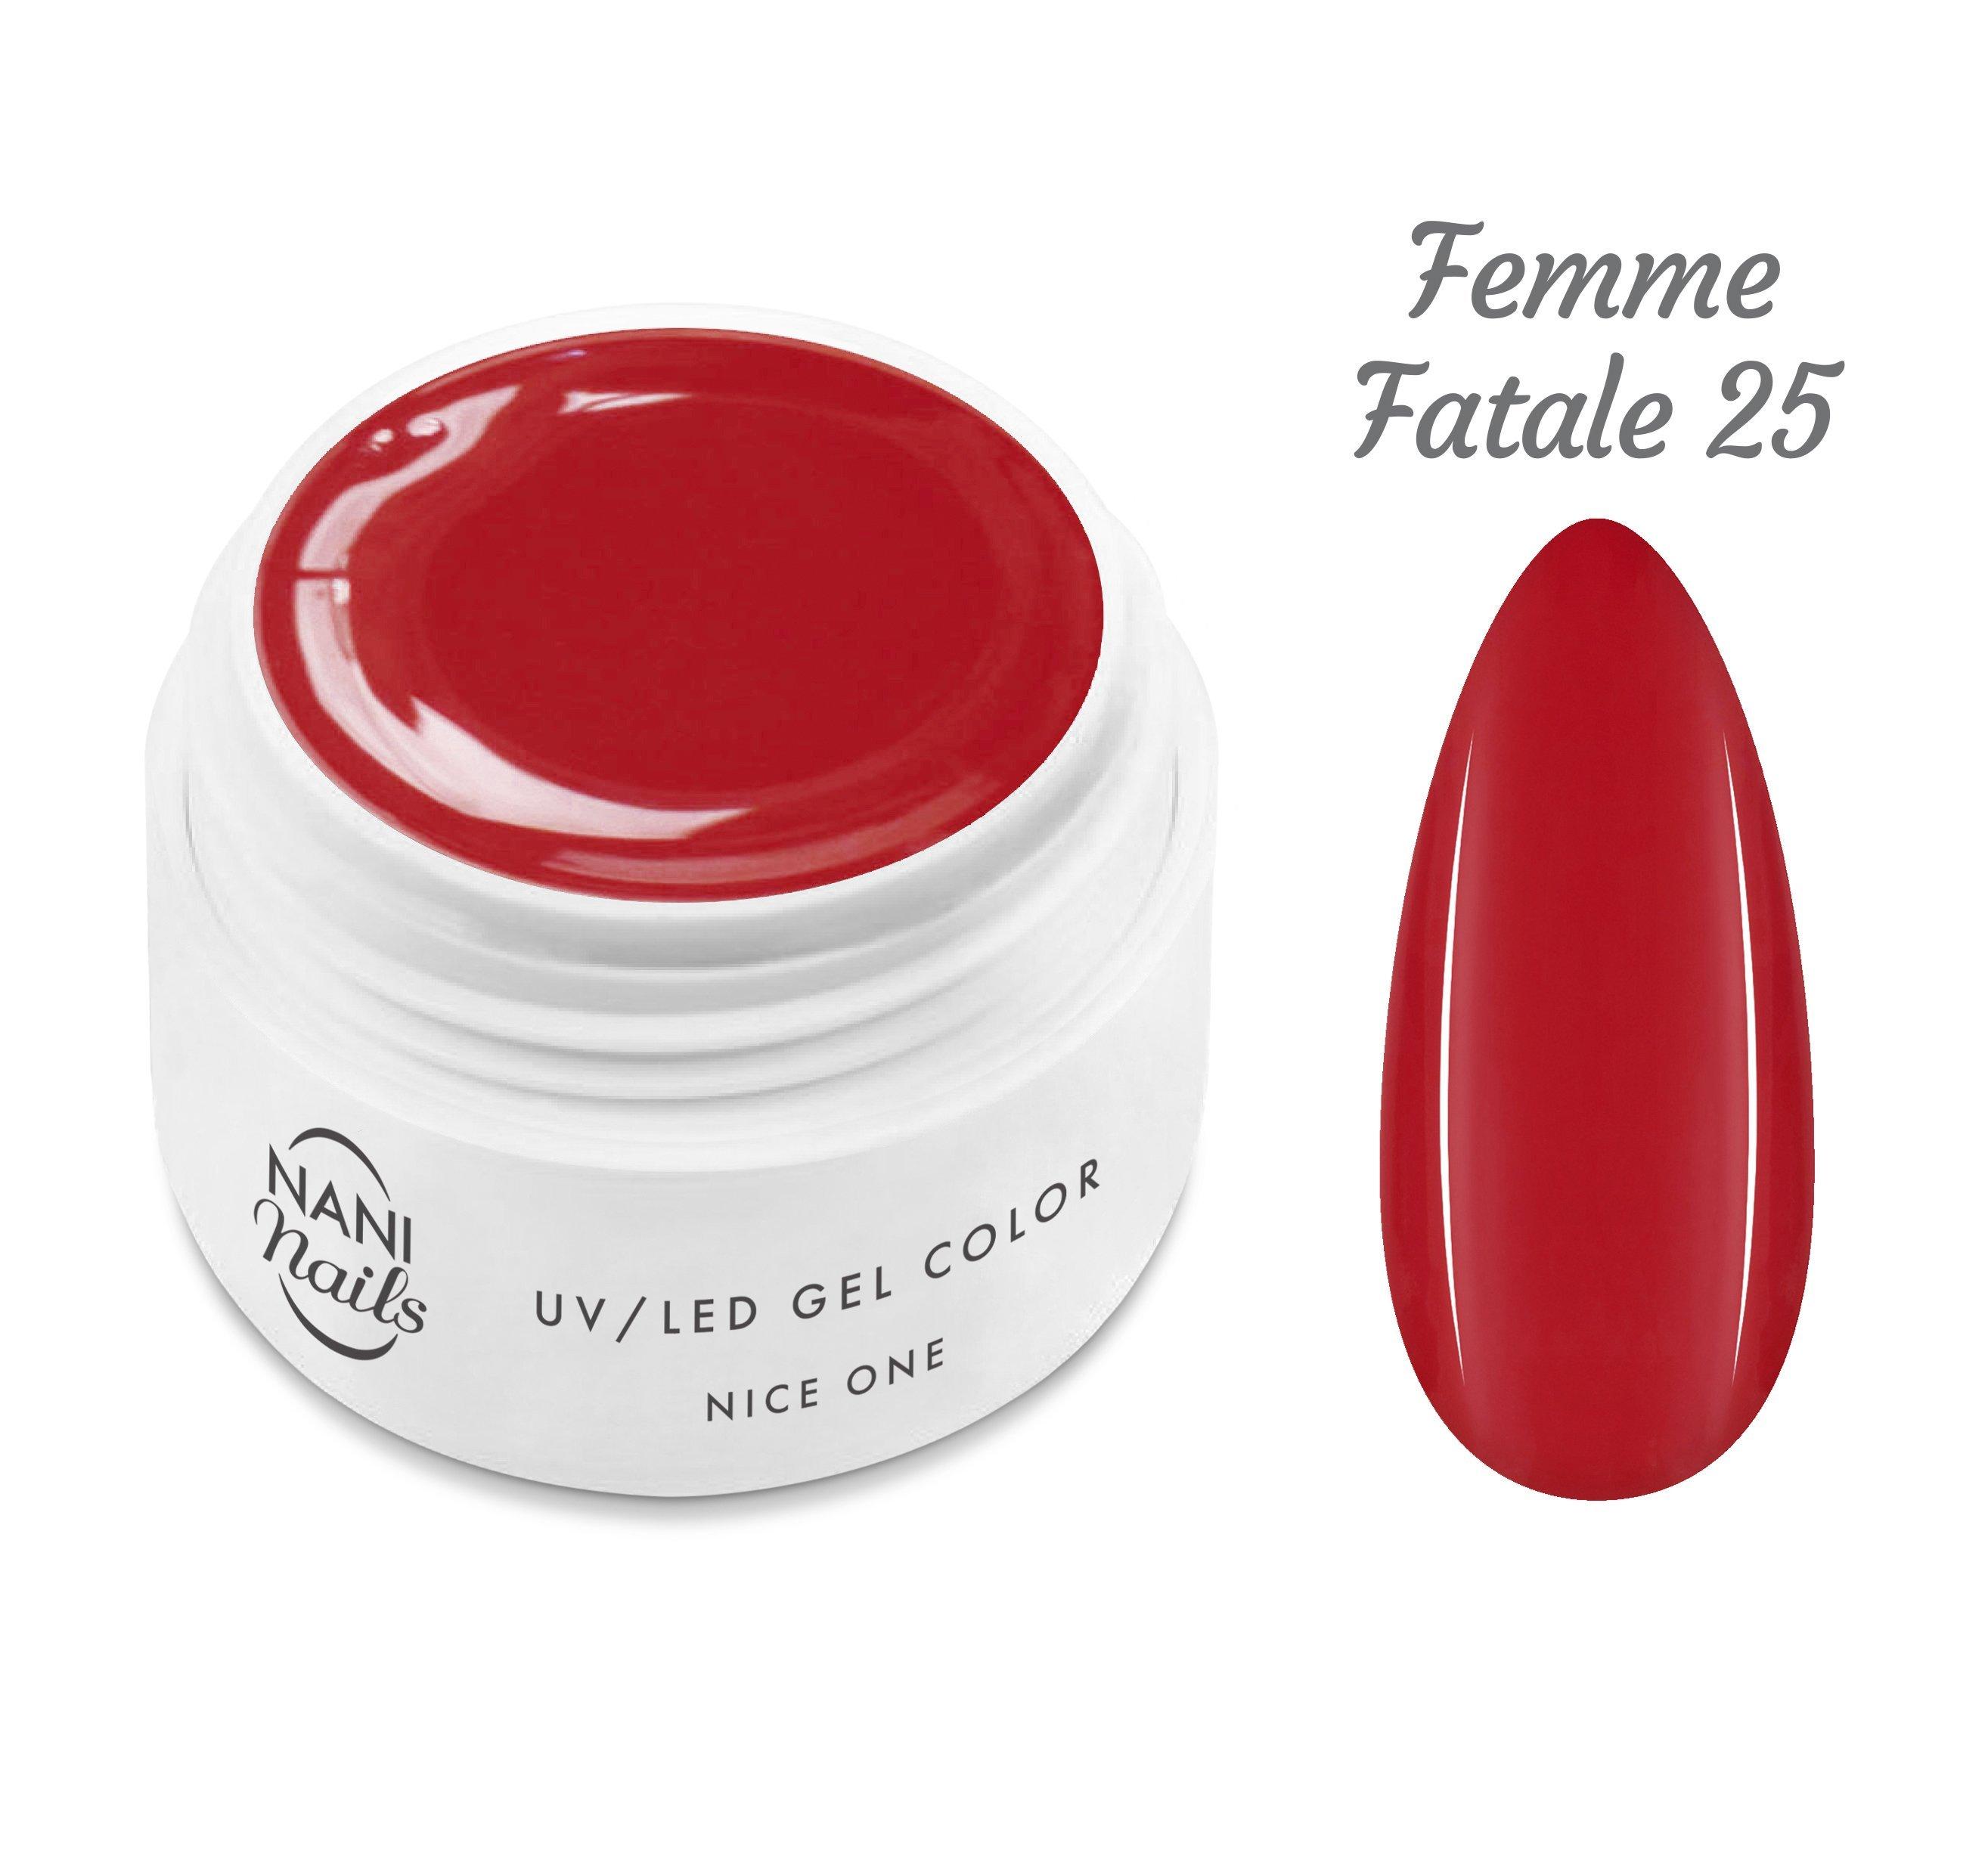 NANI UV gél Nice One Color 5 ml - Femme Fatale